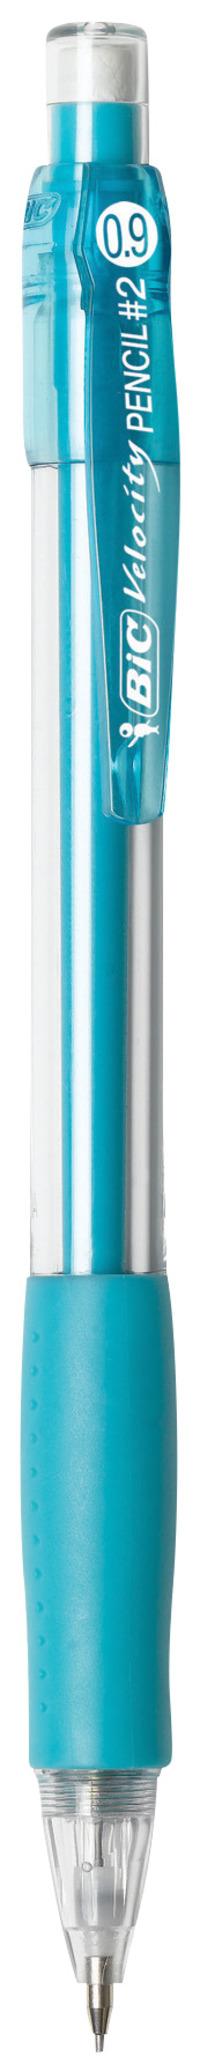 Mechanical Pencils, Item Number 079021